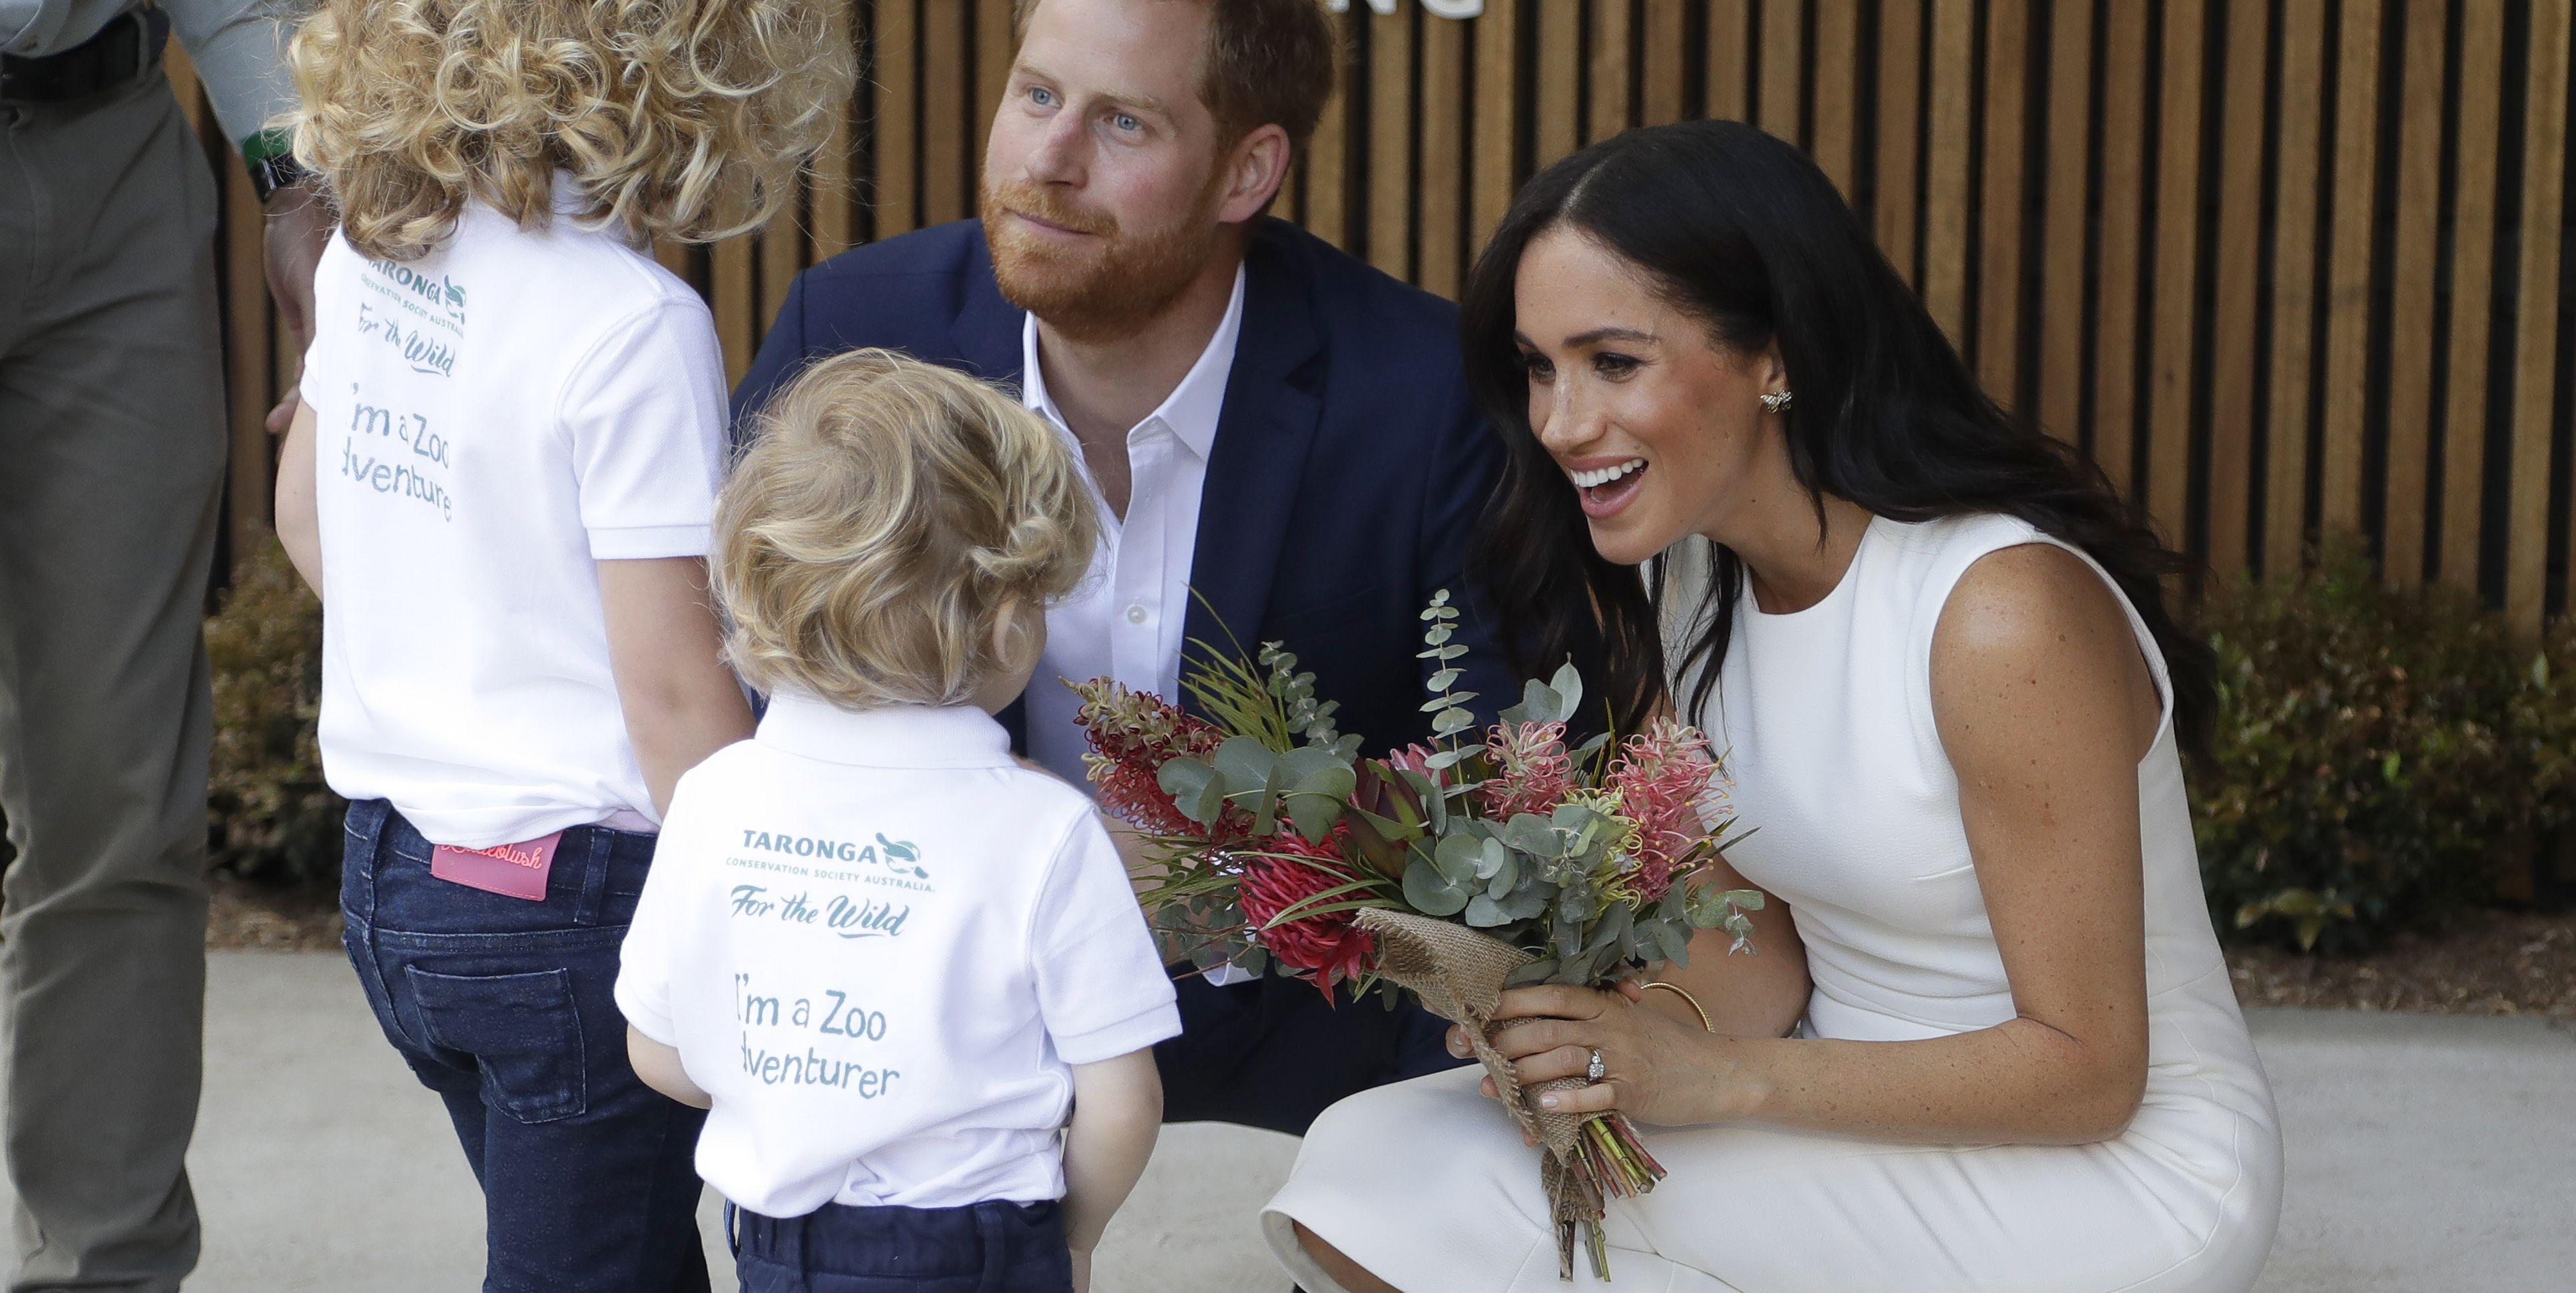 Meghan Markle and Prince Harry Body Language Towards Kids